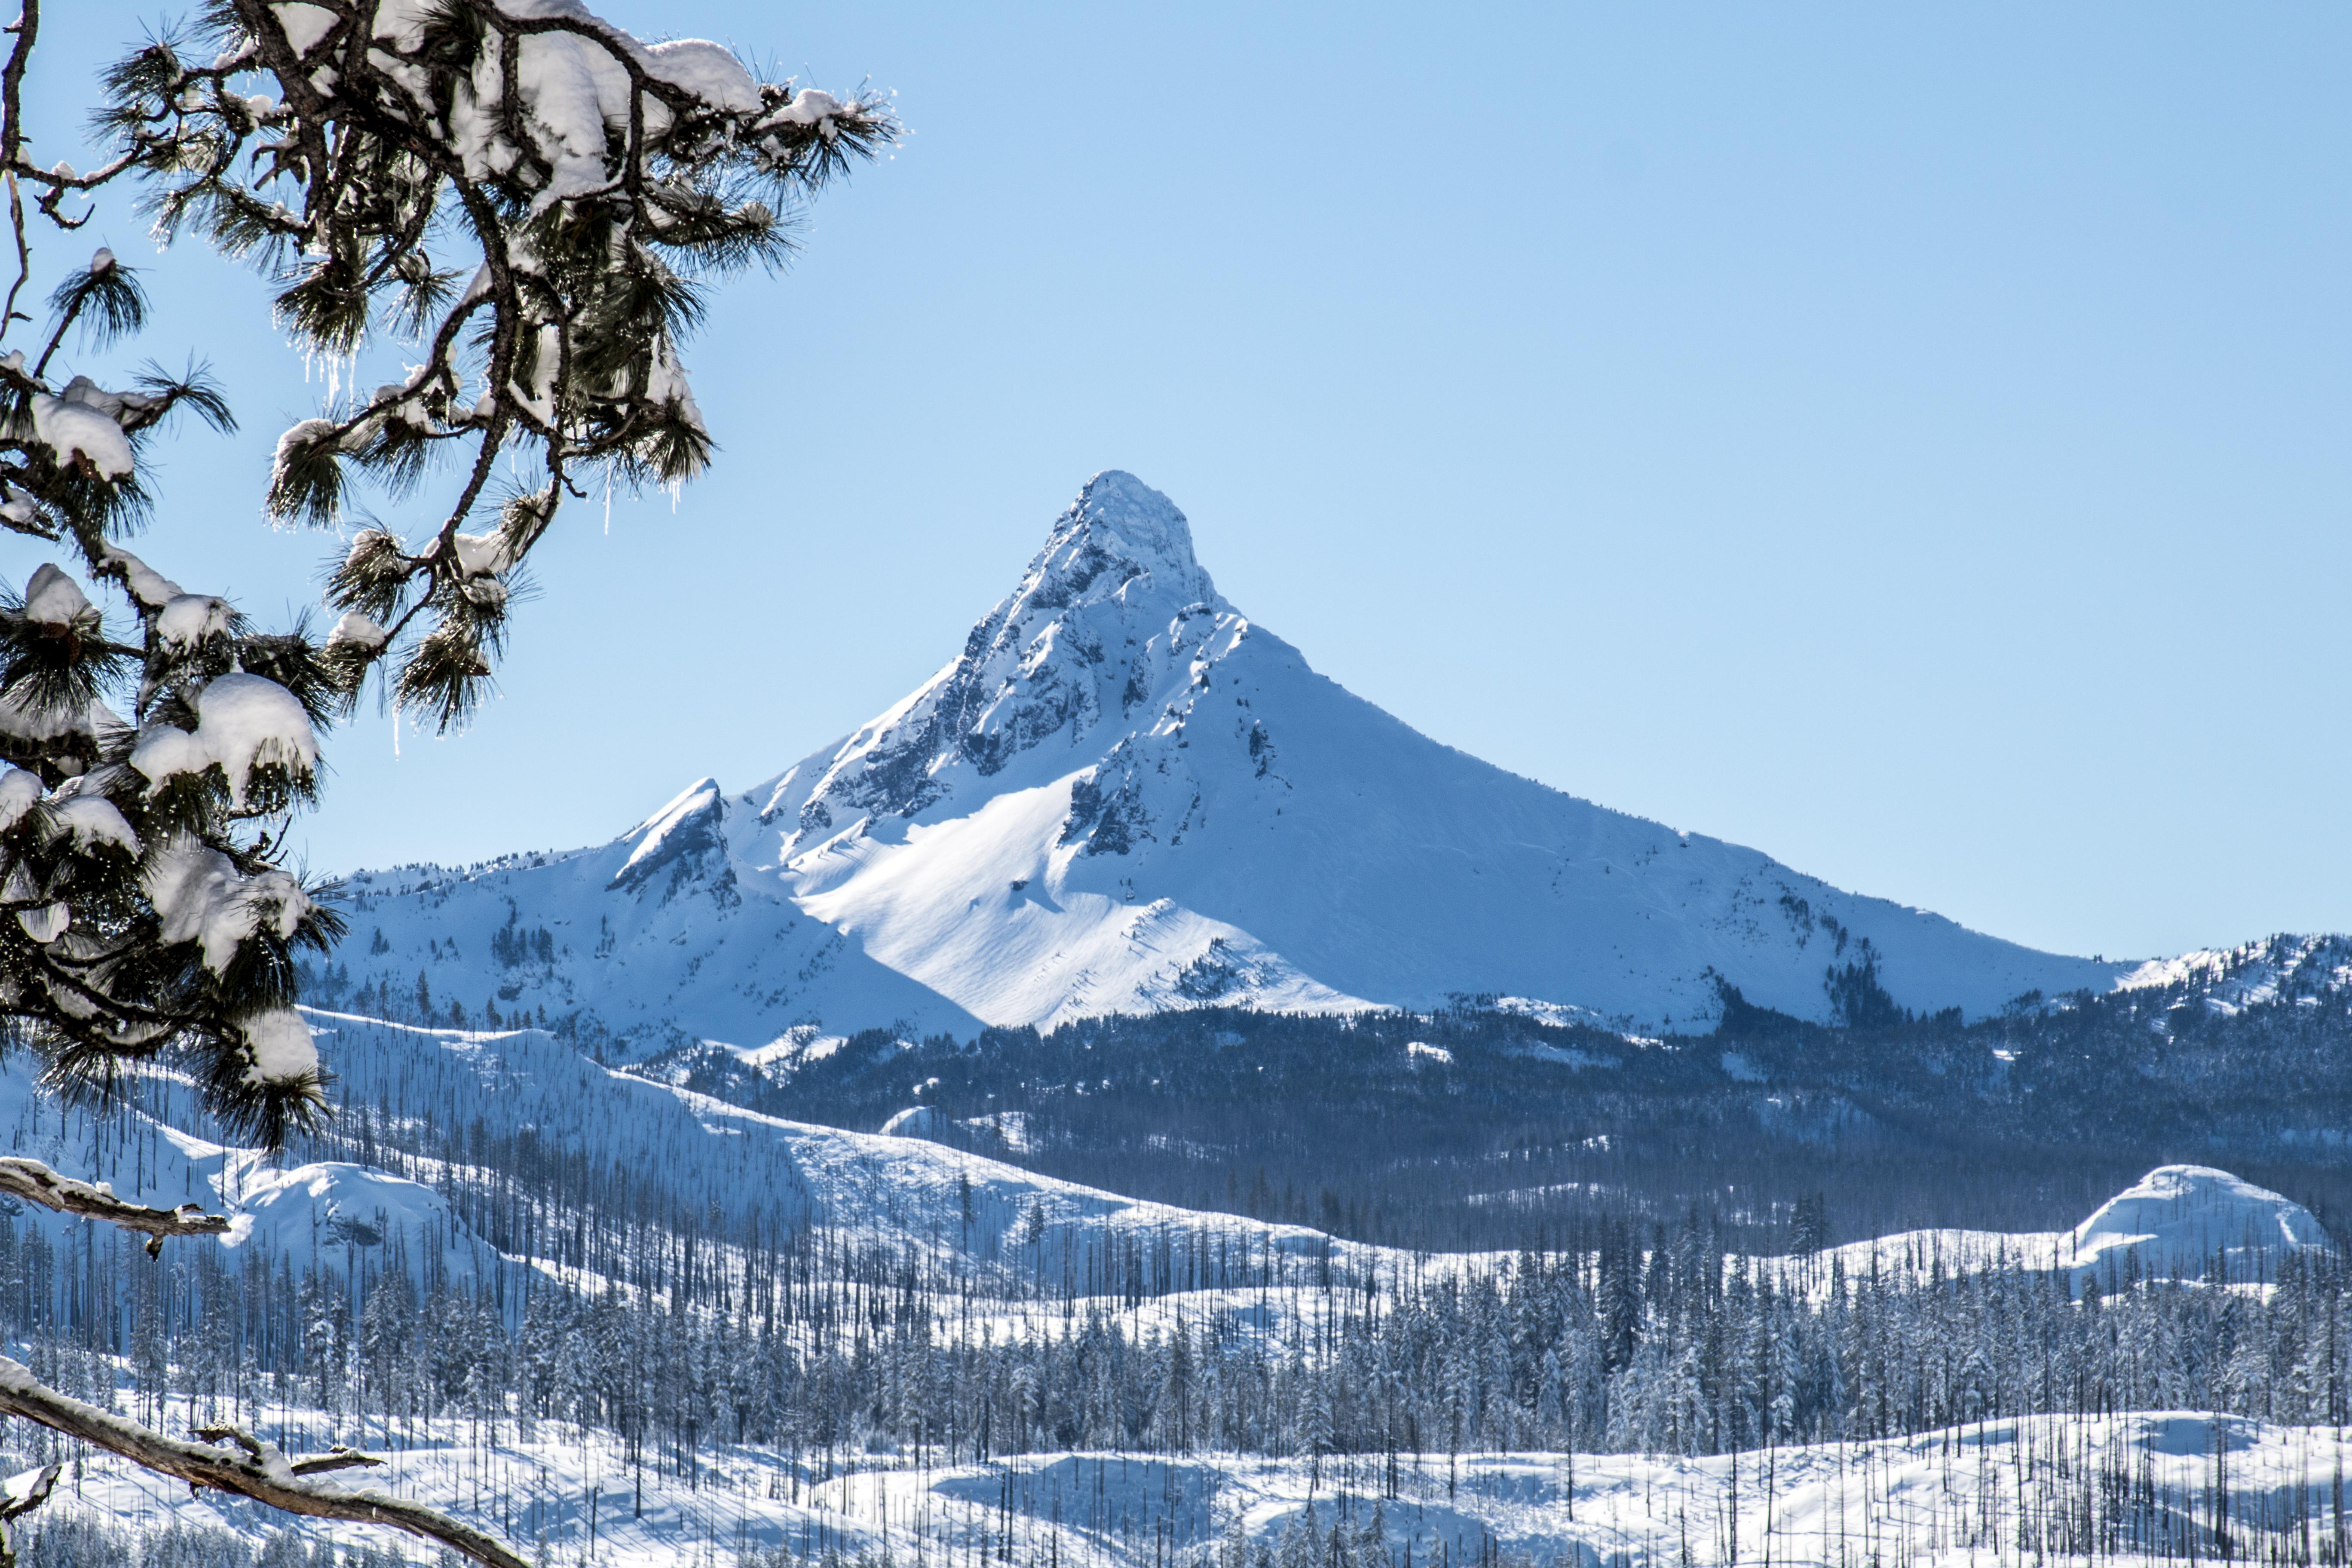 Mt washington, oregon in january photo